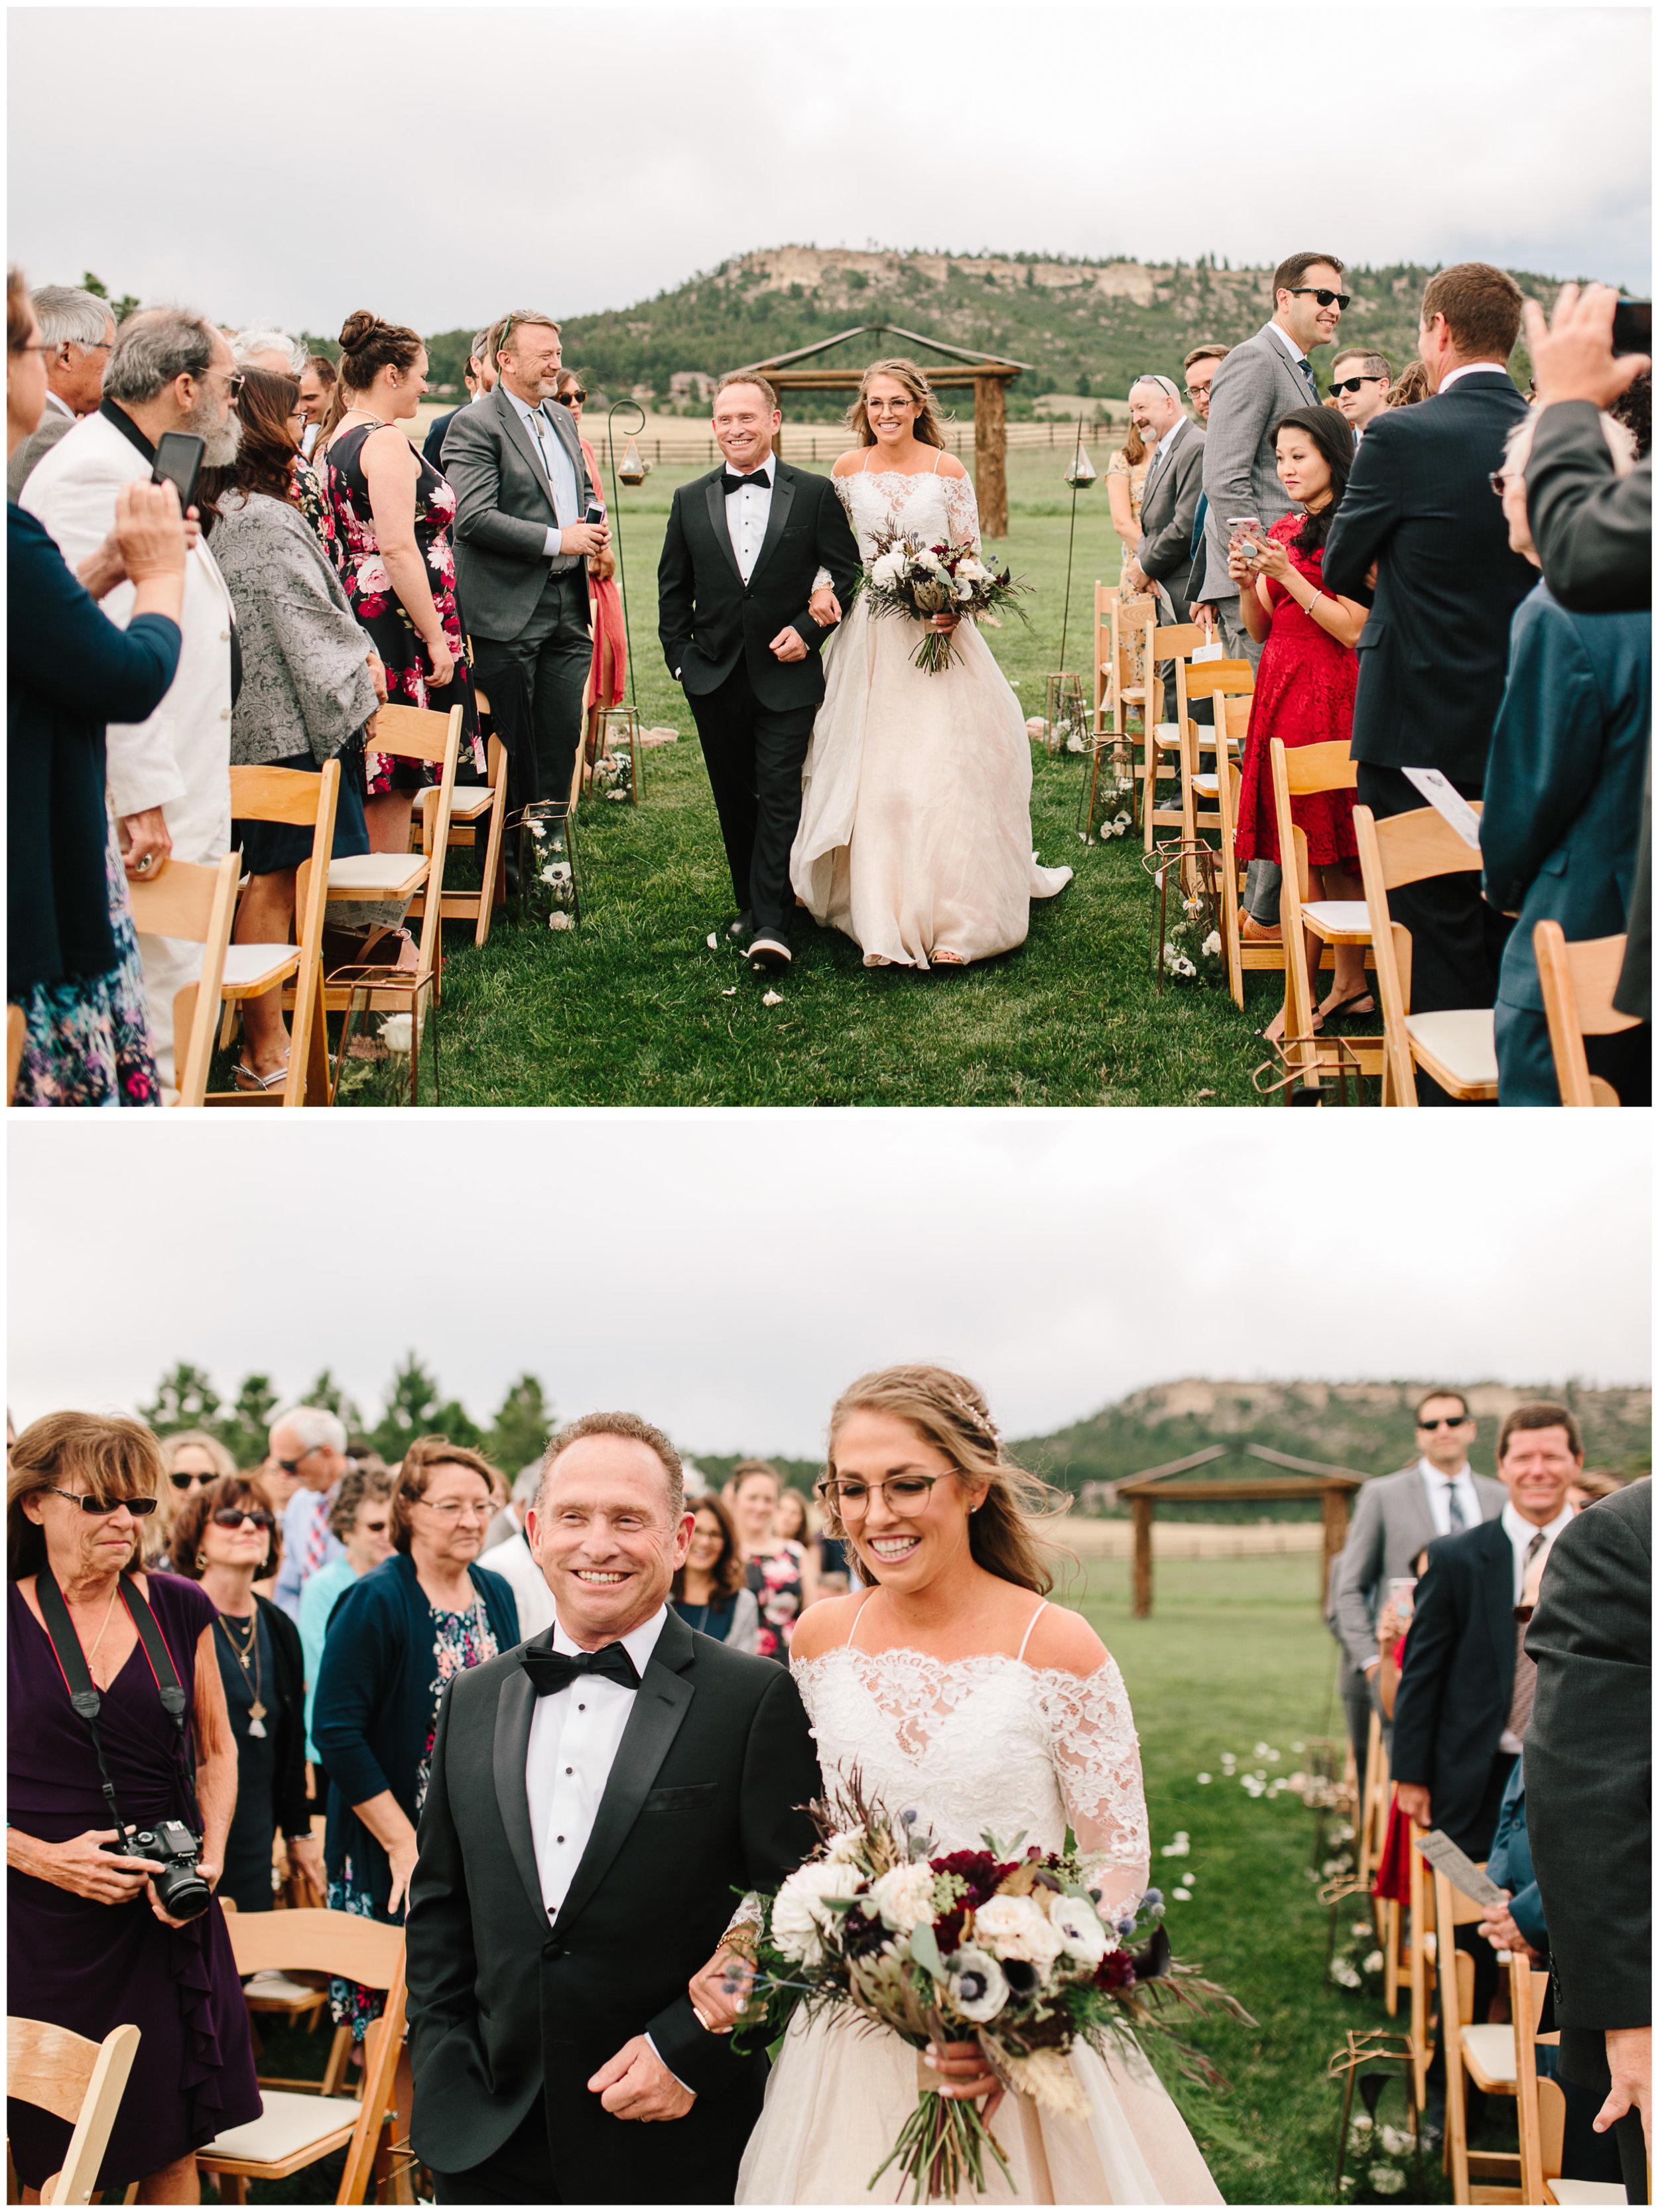 spruce_mountain_ranch_wedding_51.jpg